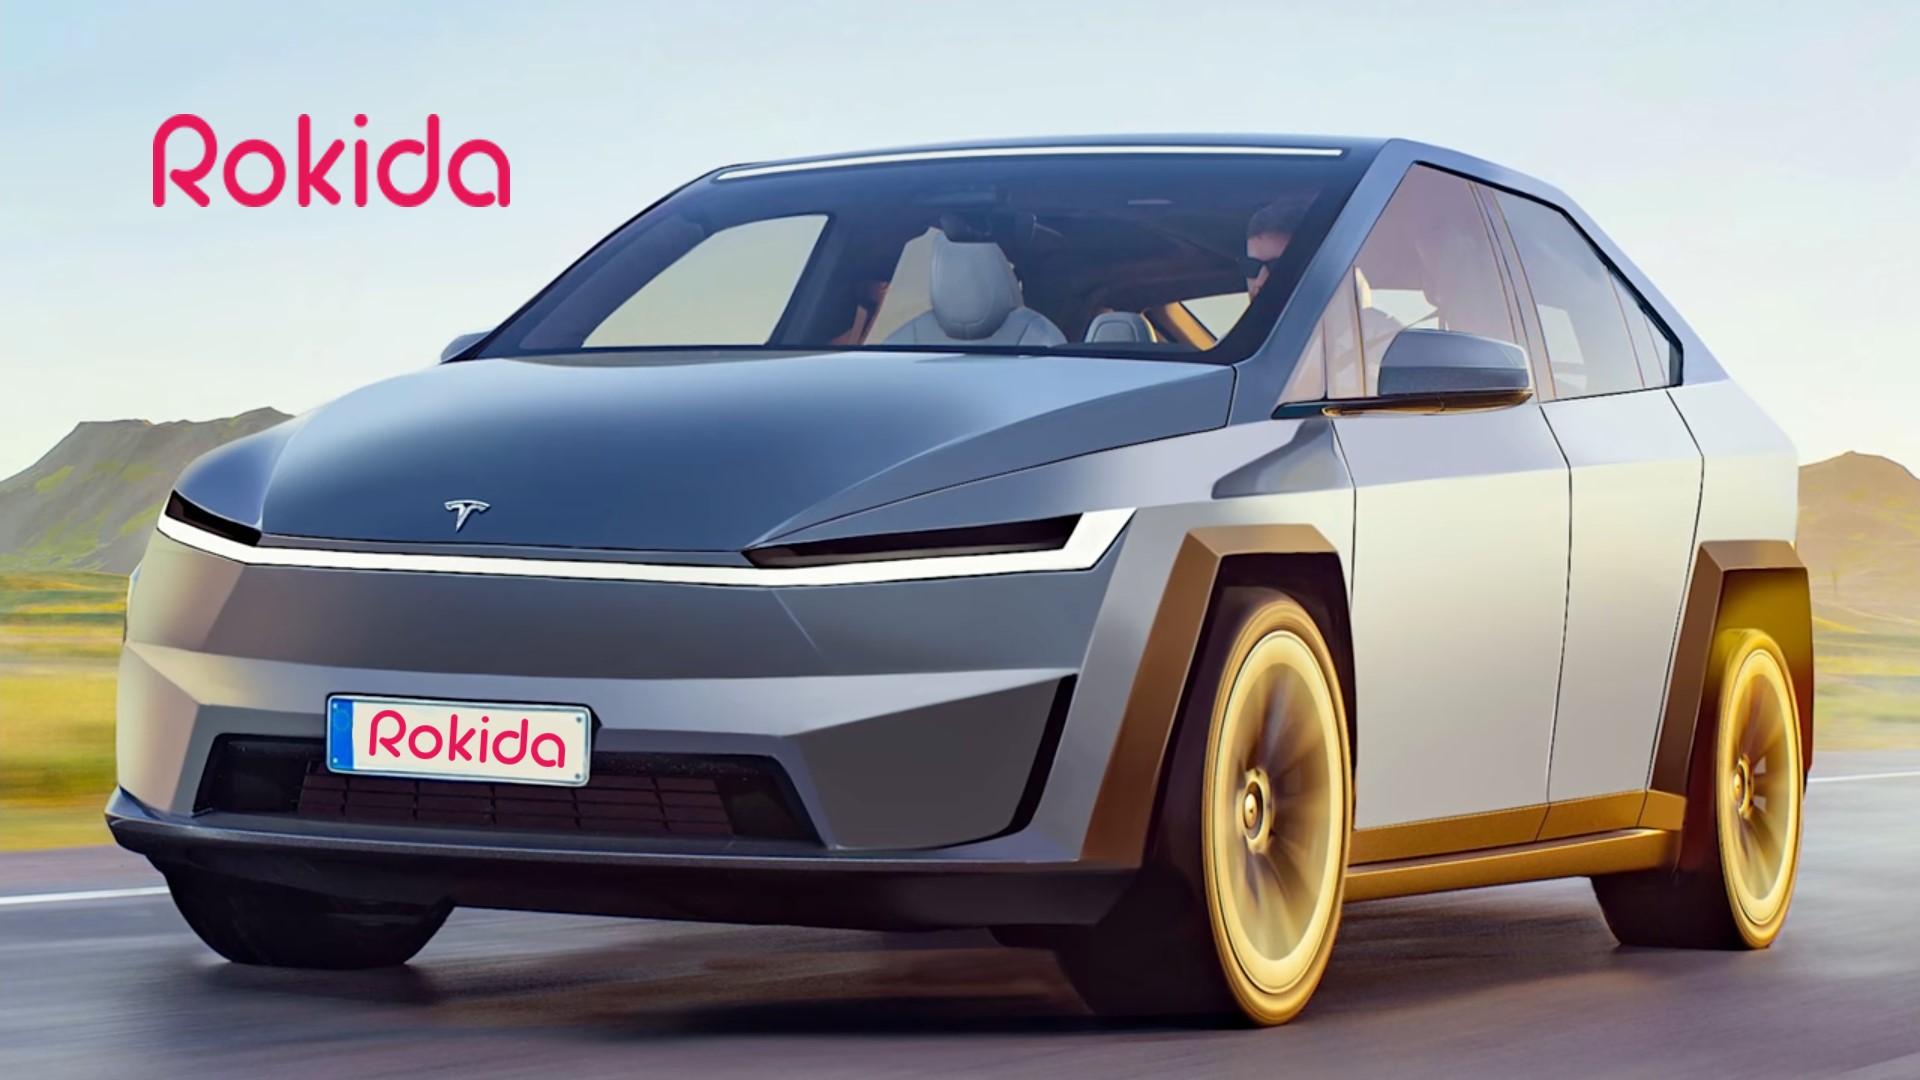 نسخهی جدید تسلا مدل X ( تصویر اختصاصی سایت روکیدا )